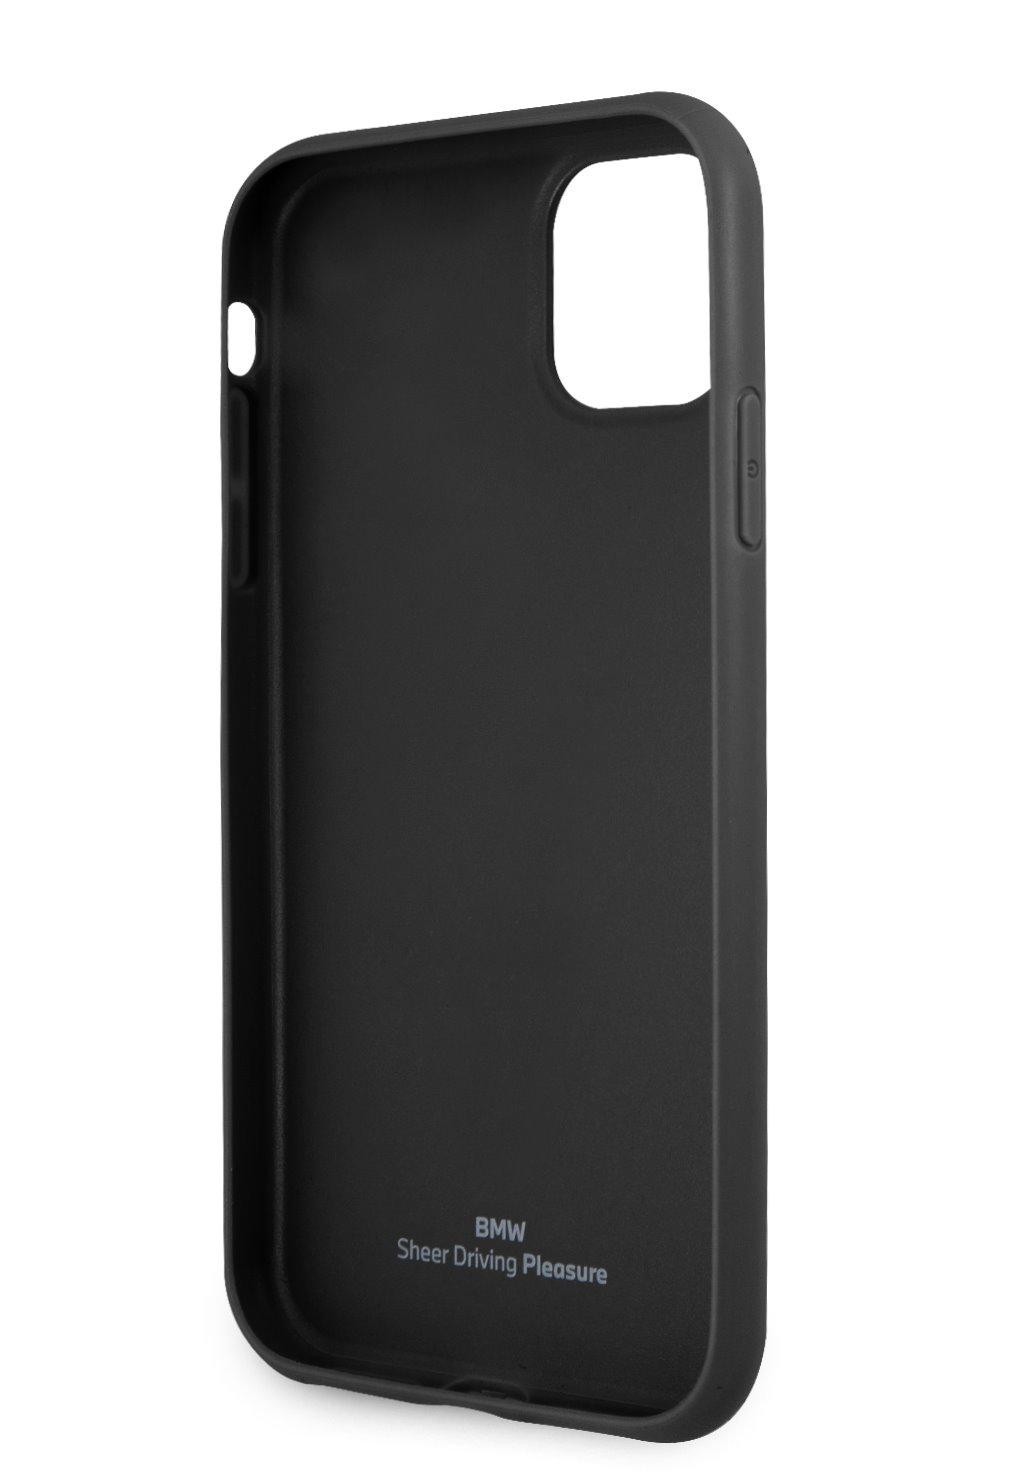 Ochranný kryt BMW Signature Leather Embossed Logo BMHCN61REELK pro Apple iPhone 11, černá